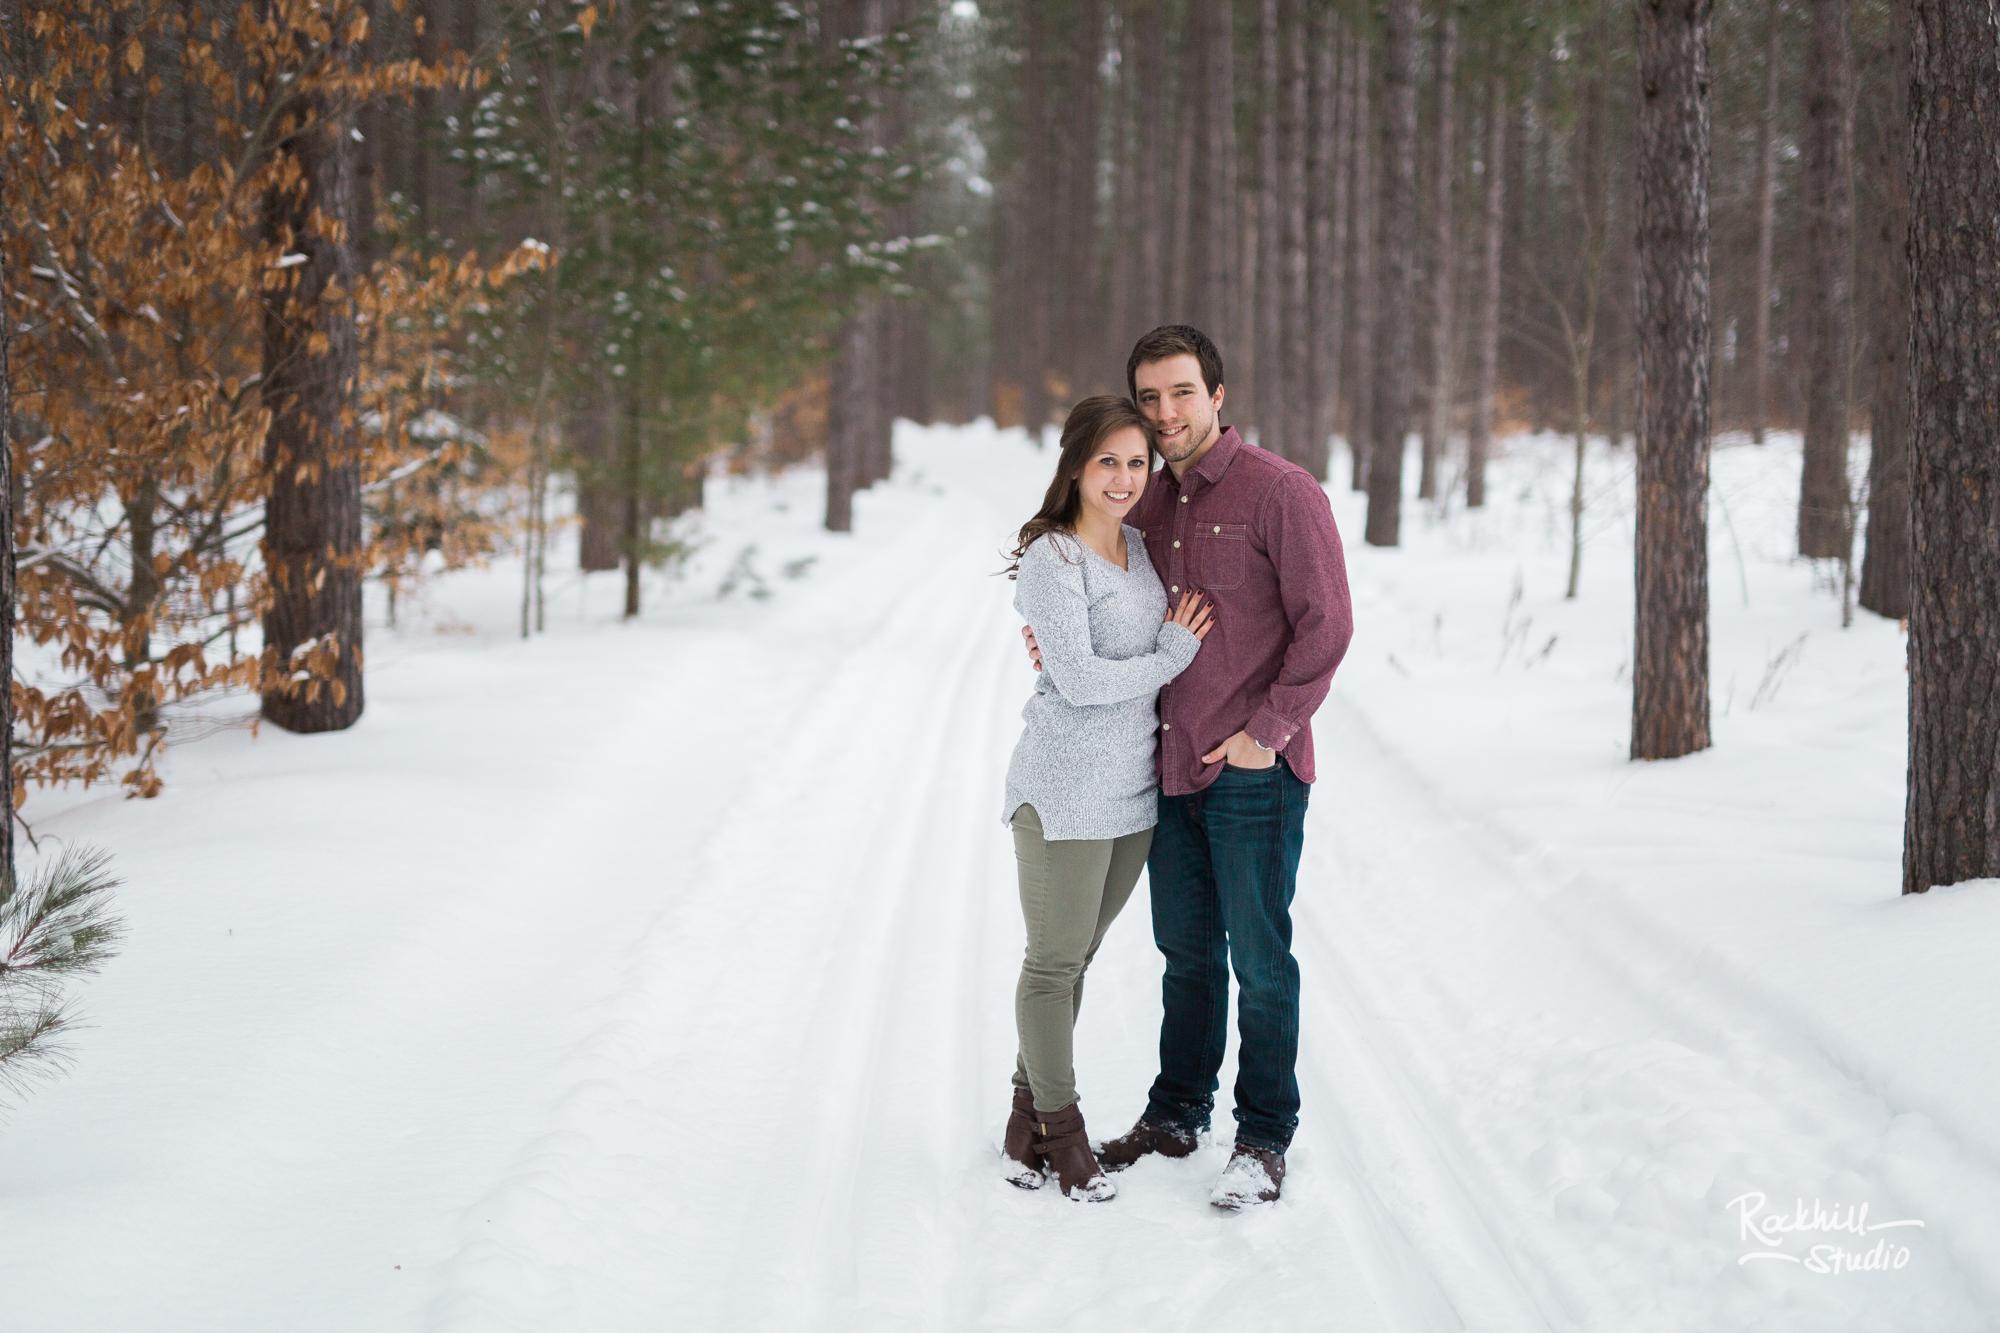 rockhill-studio-northern-michigan-engagement-photography-upper-peninsula-marquette-wedding-winter-22.jpg